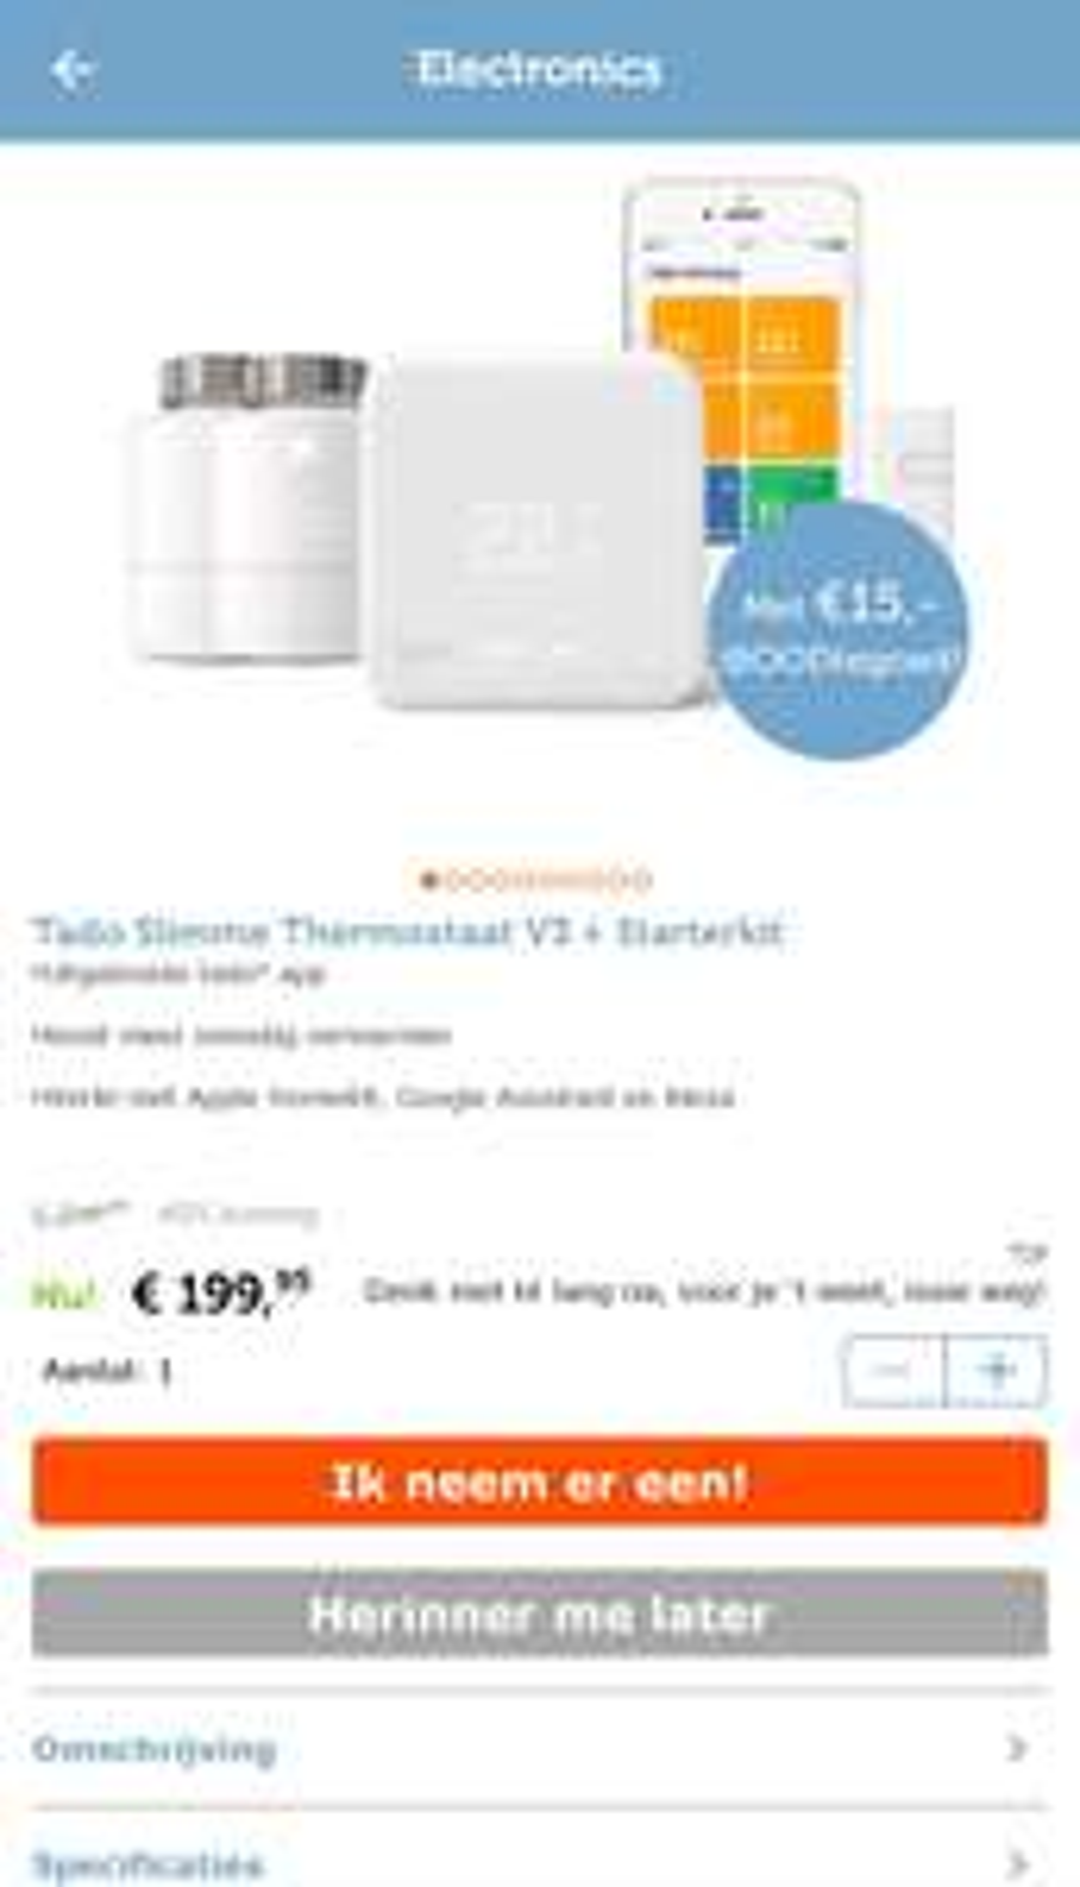 Tado Slimme Thermostaat V3 + Starterkit met 2 radiatorknoppen + €15 shoptegoed @ iBood